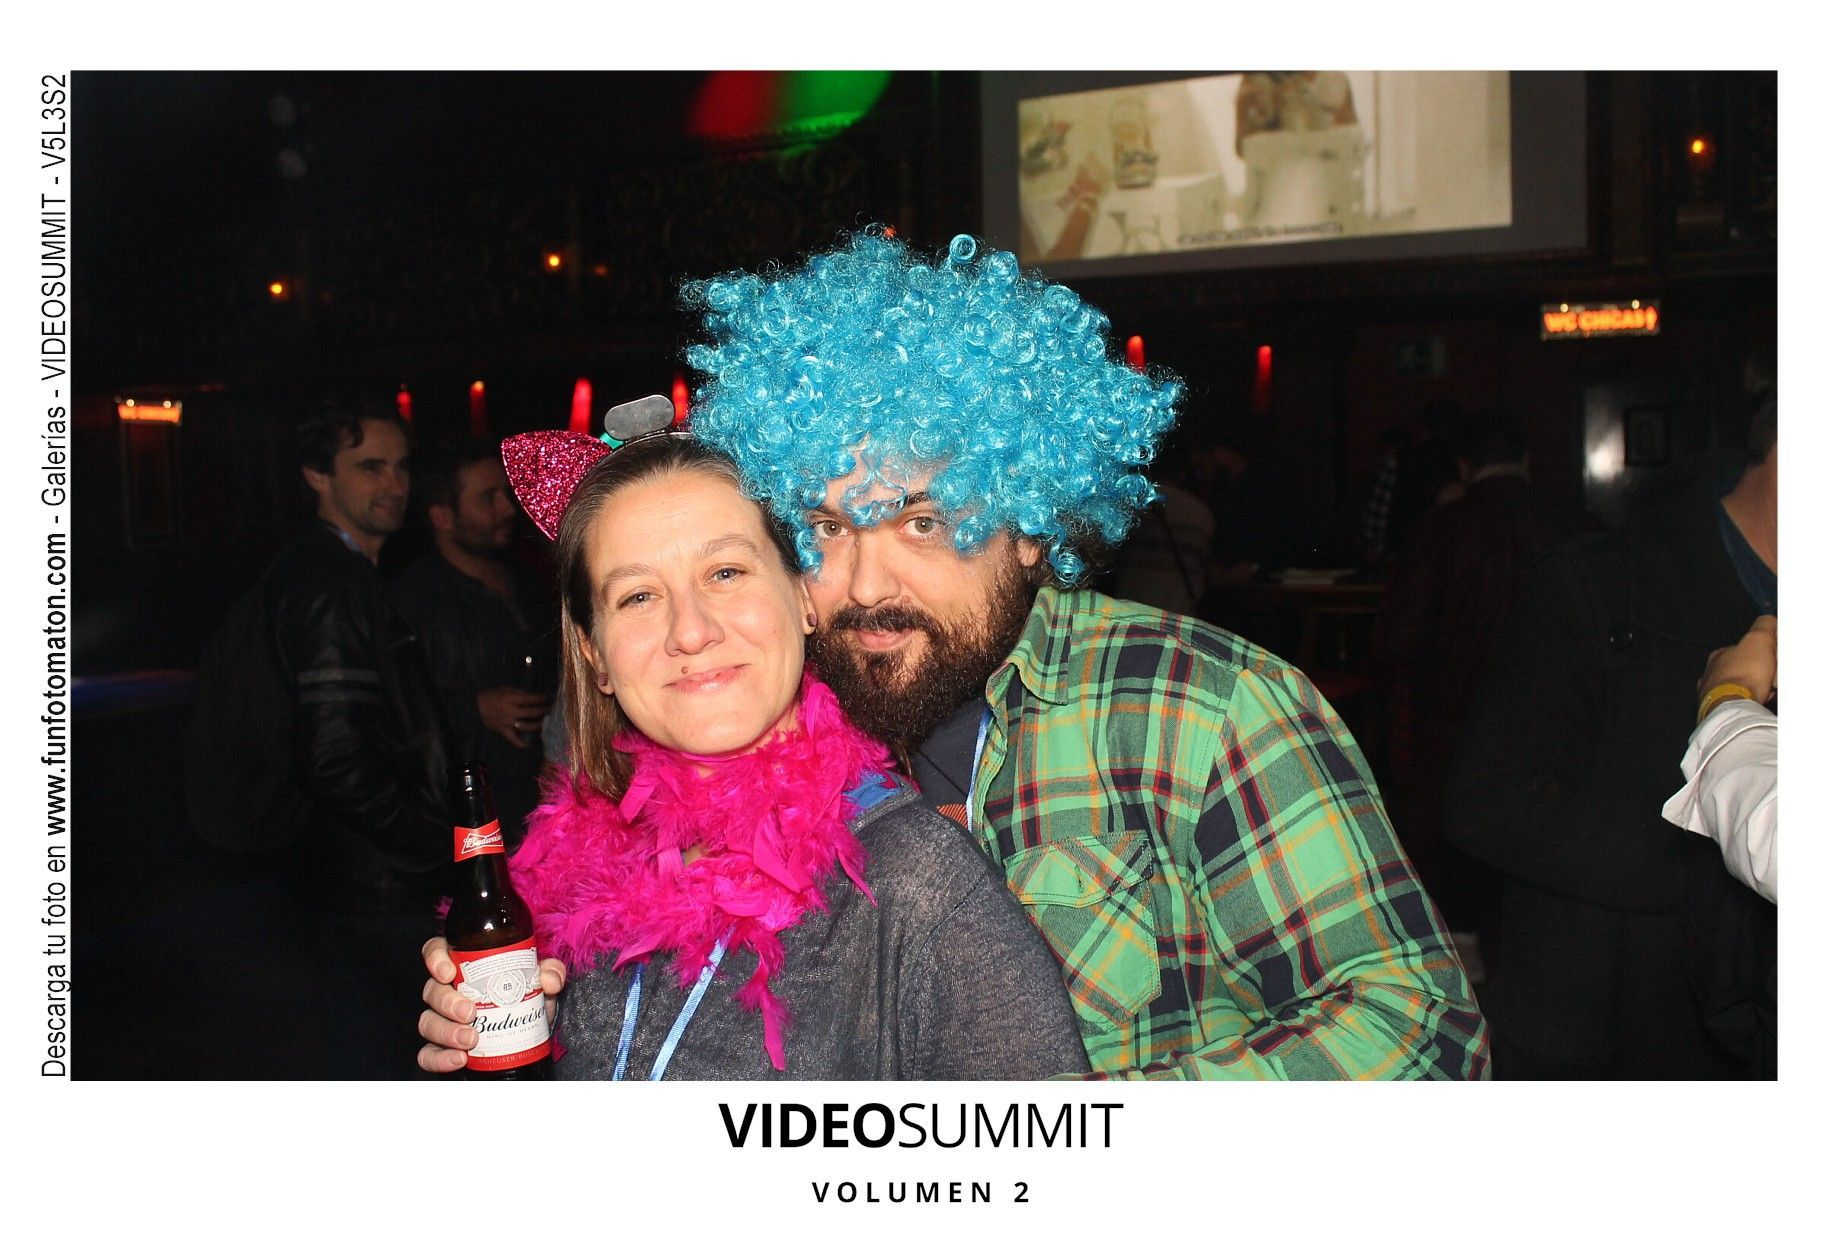 videosummit-vol2-club-party-014